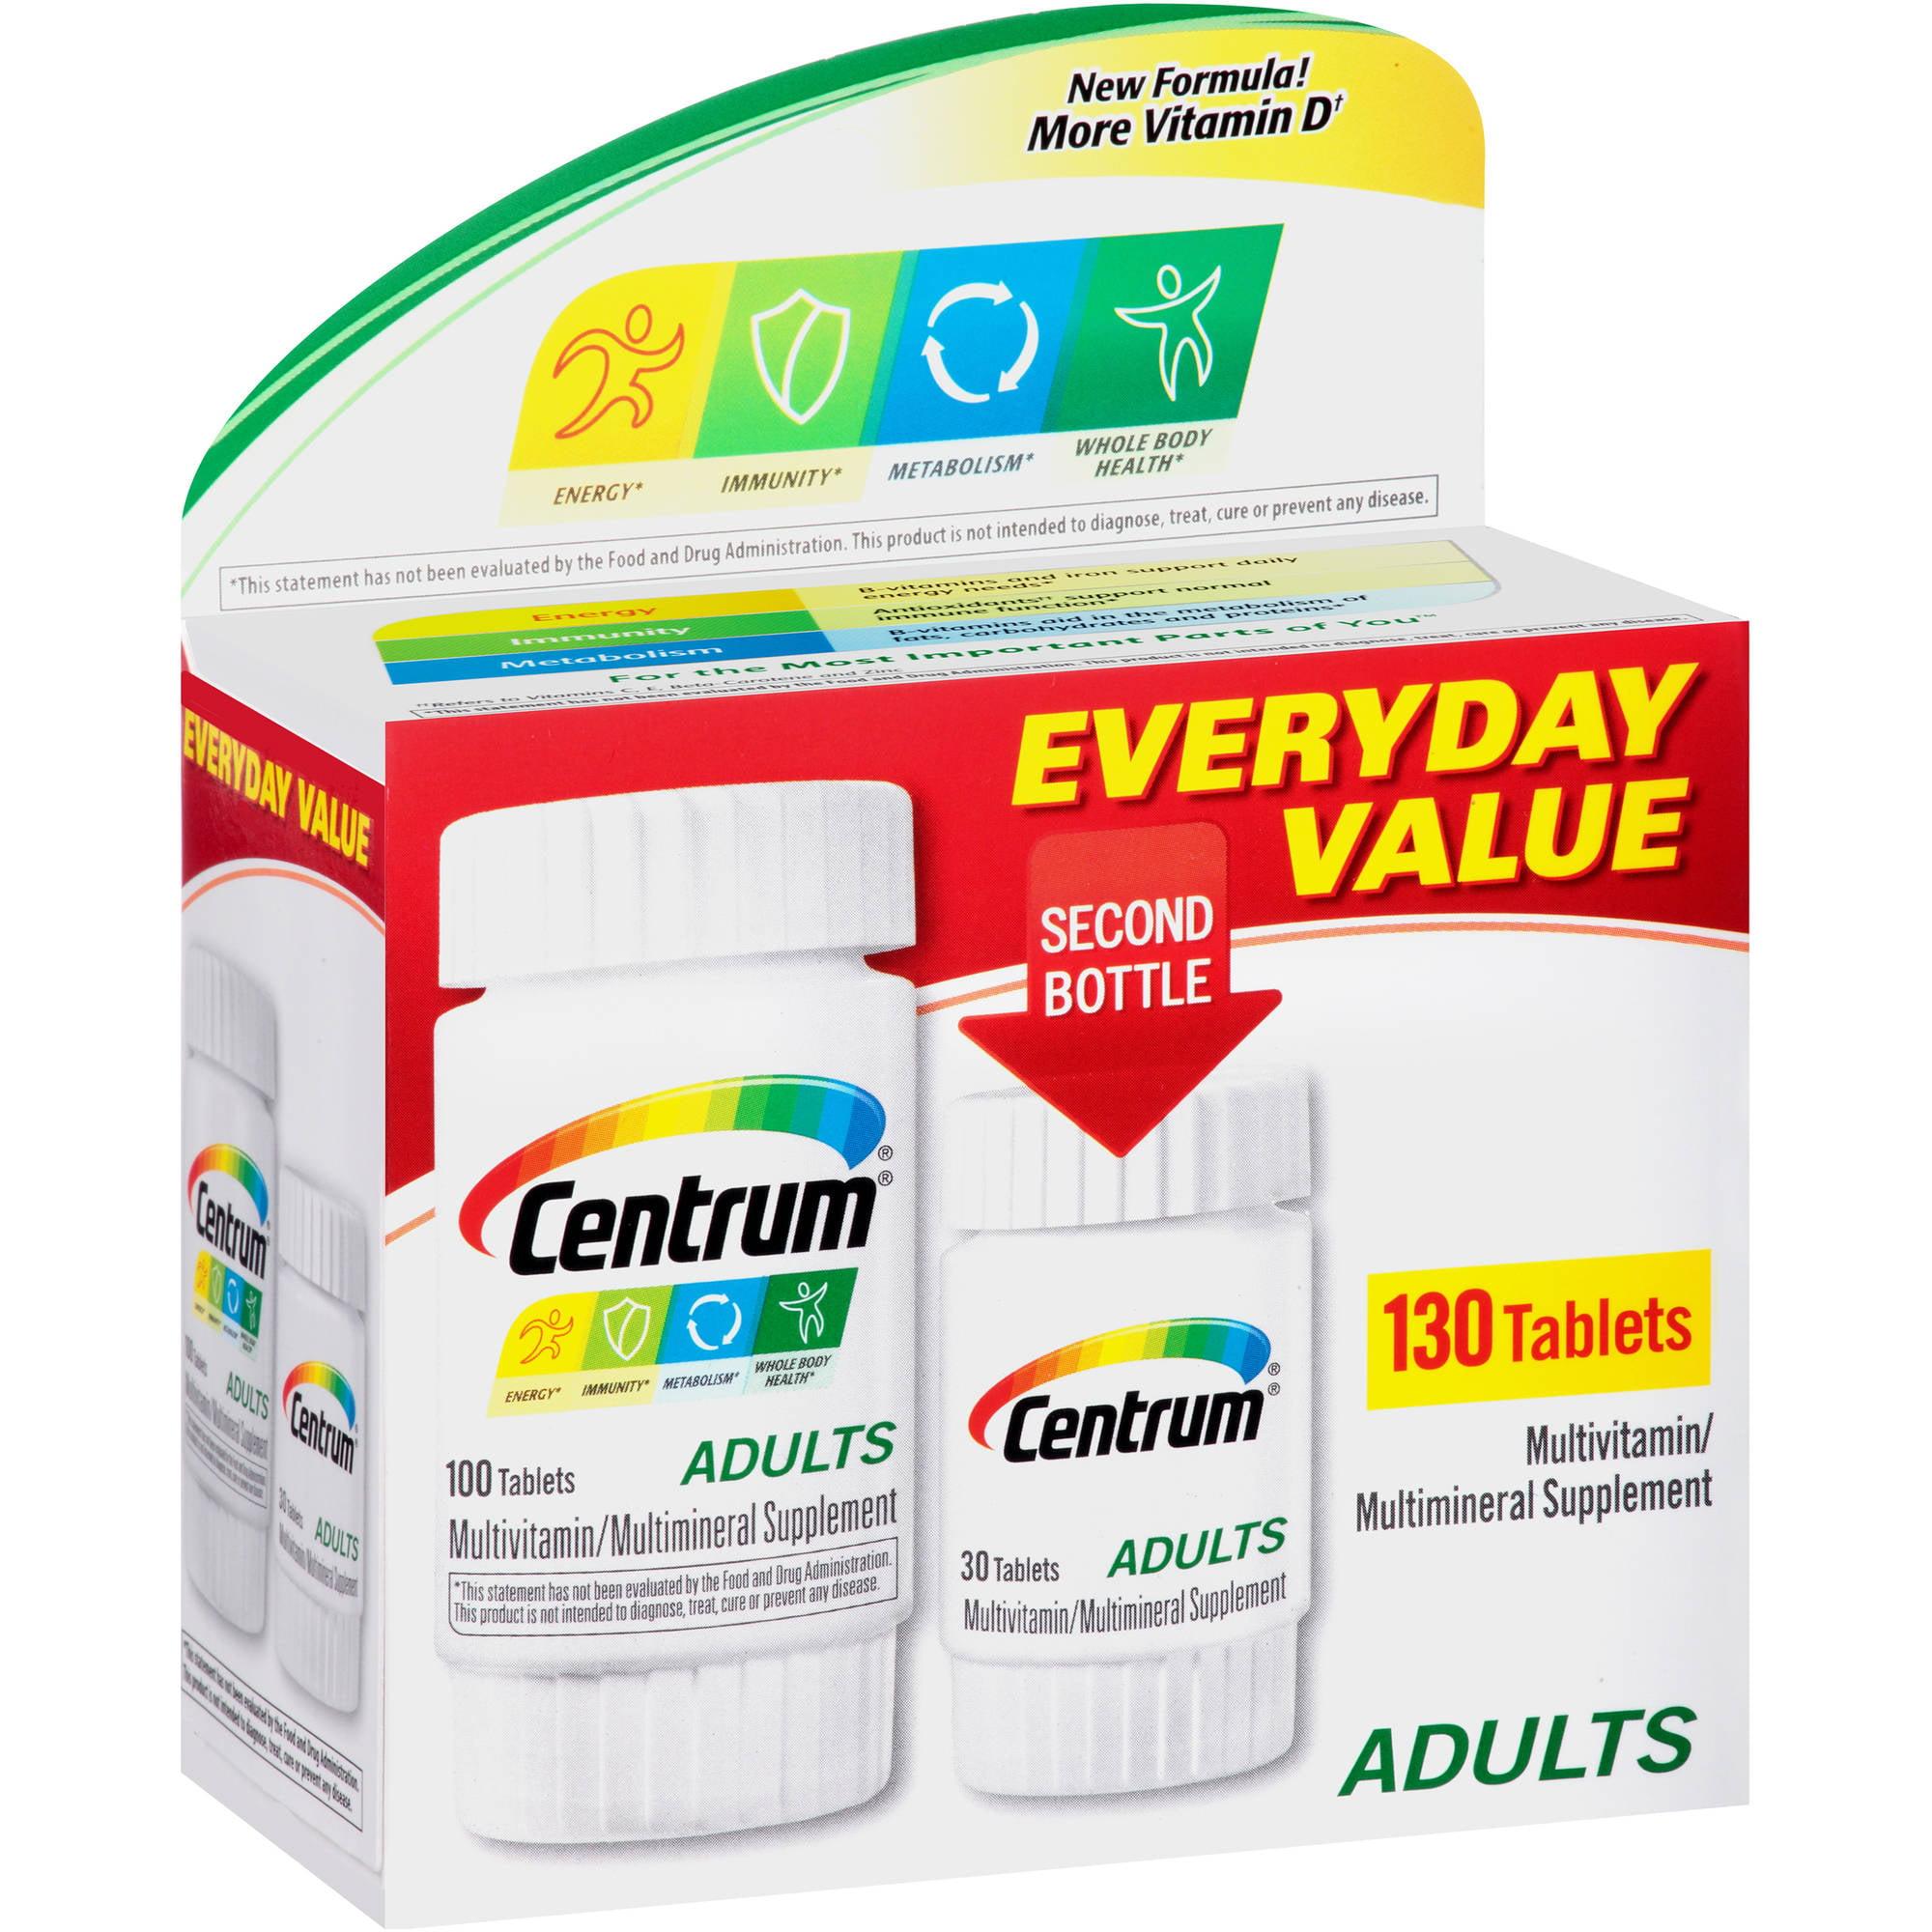 Centrum Adult Multivitamin/Multimineral Tablets 130 Count